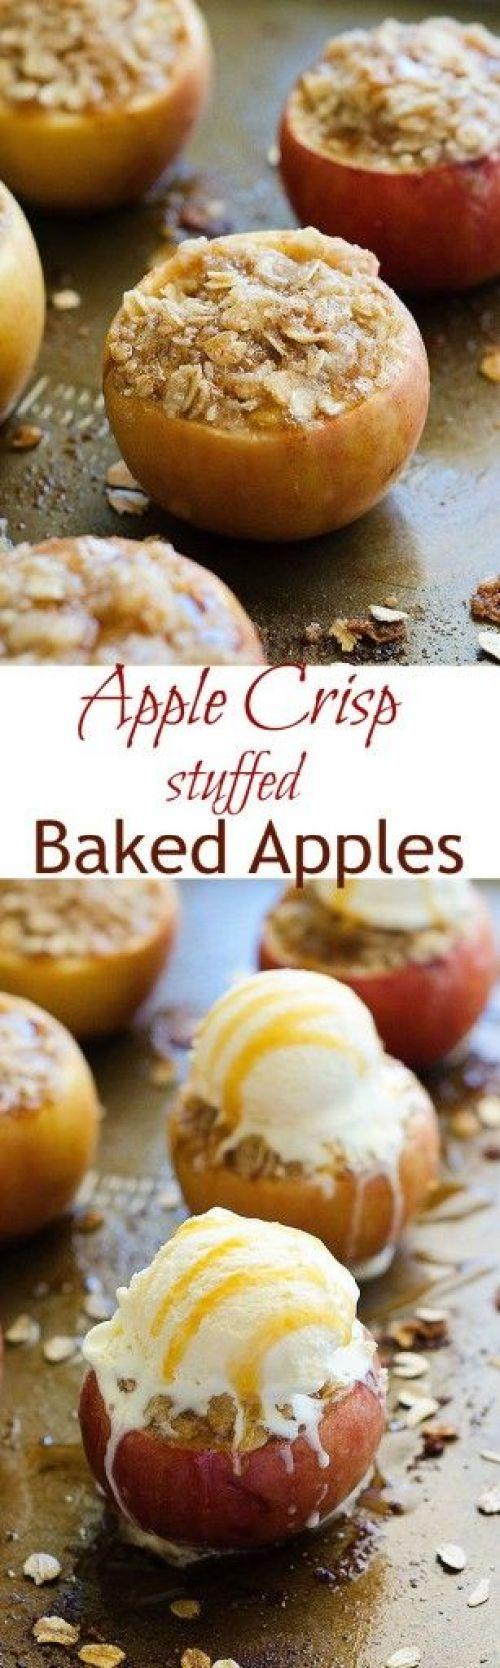 Apple Crisp Stuffed Baked Apples Recipe | Life in The Lofthouse - Apple Recipes